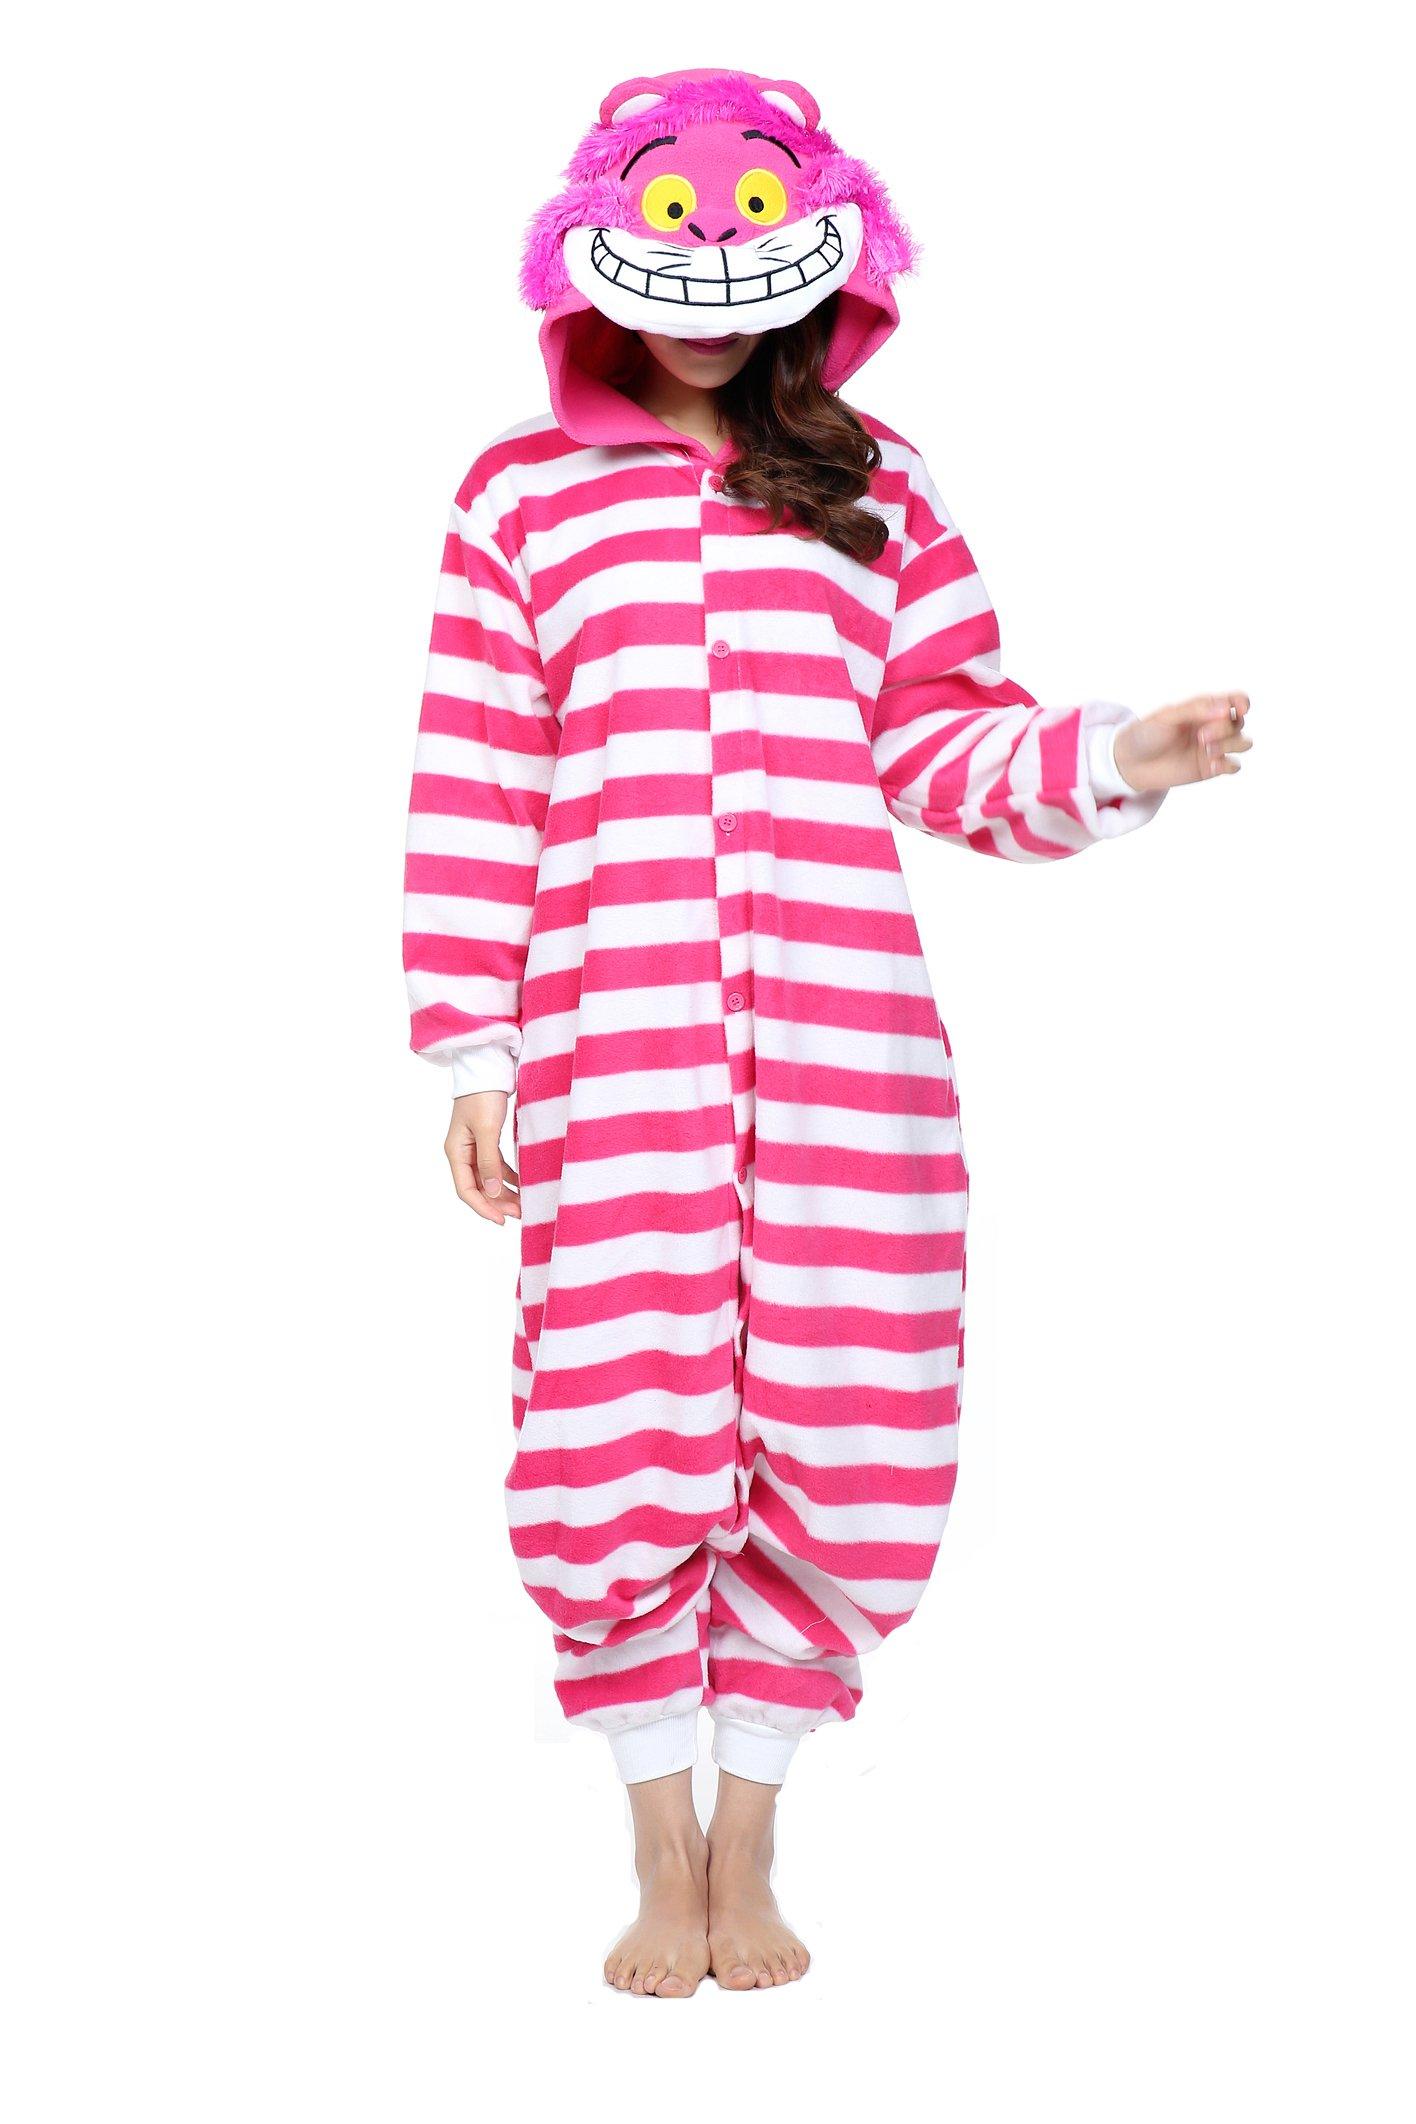 Women's Pink Cheshire Cat Anime Onesies Pajamas Kigurimi small large 3x 2x